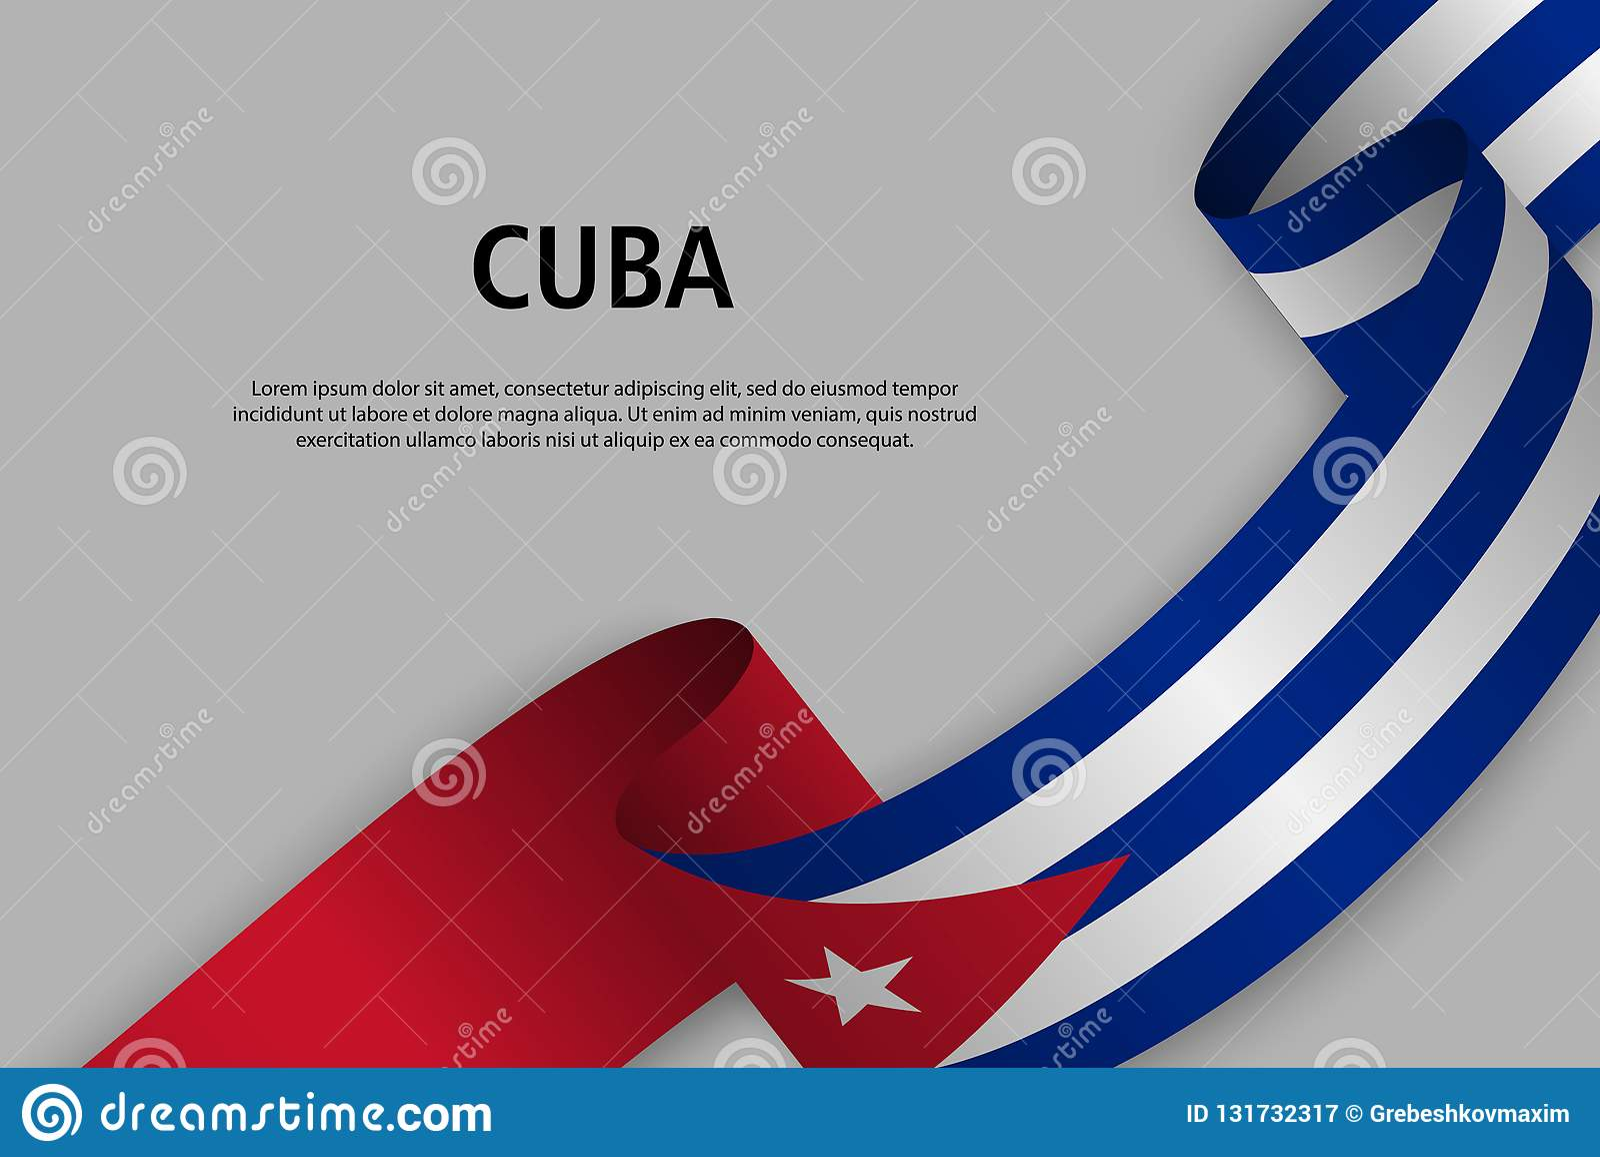 Ruban de ondulation avec le drapeau du Cuba,